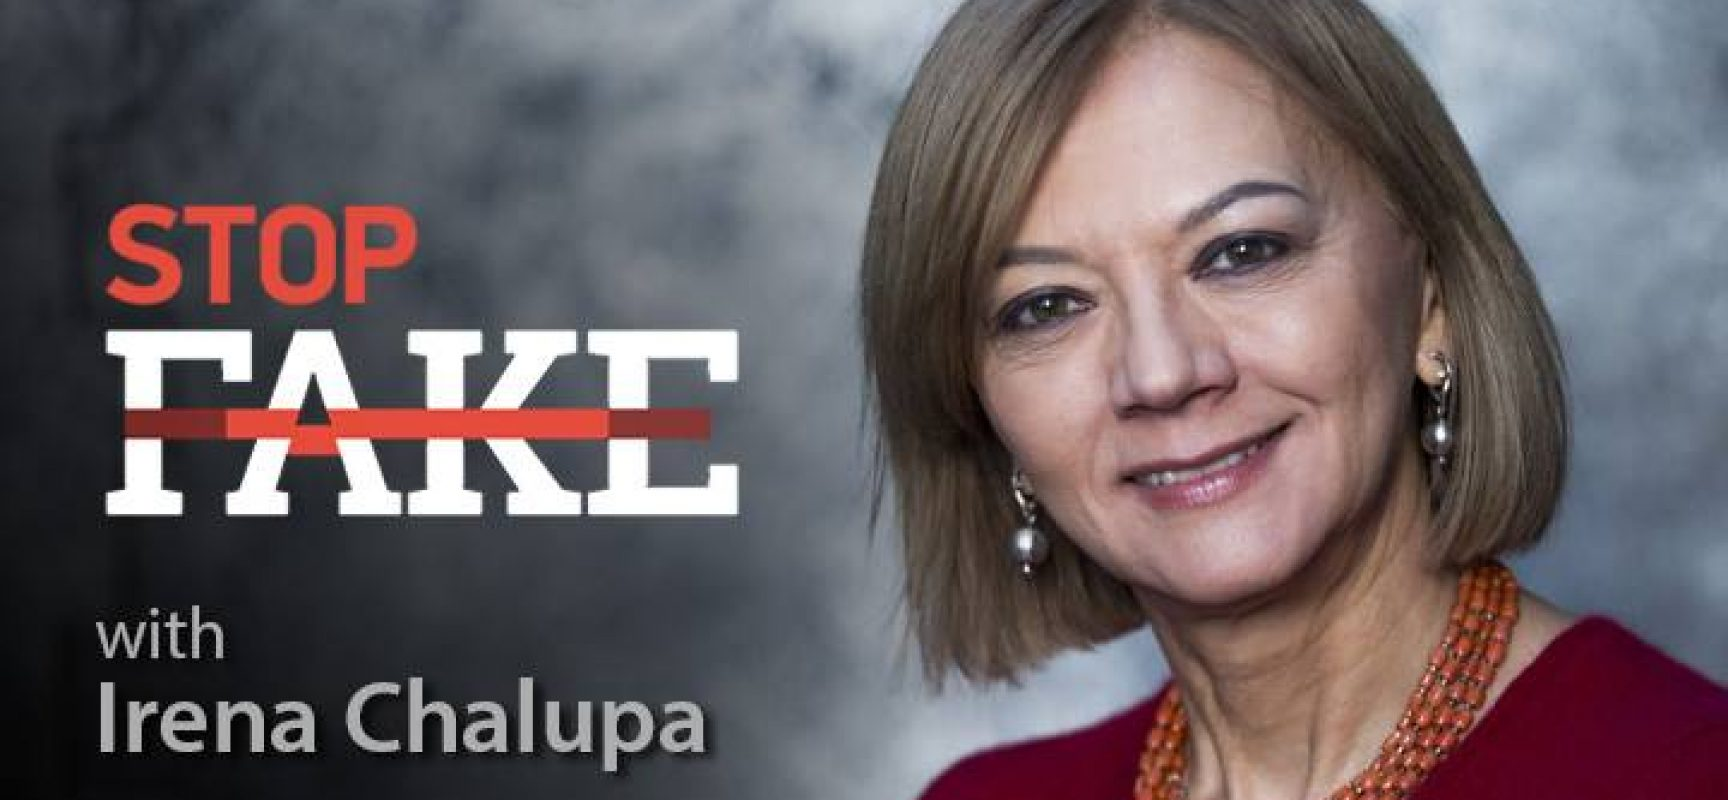 StopFake #152 con Irena Chalupa